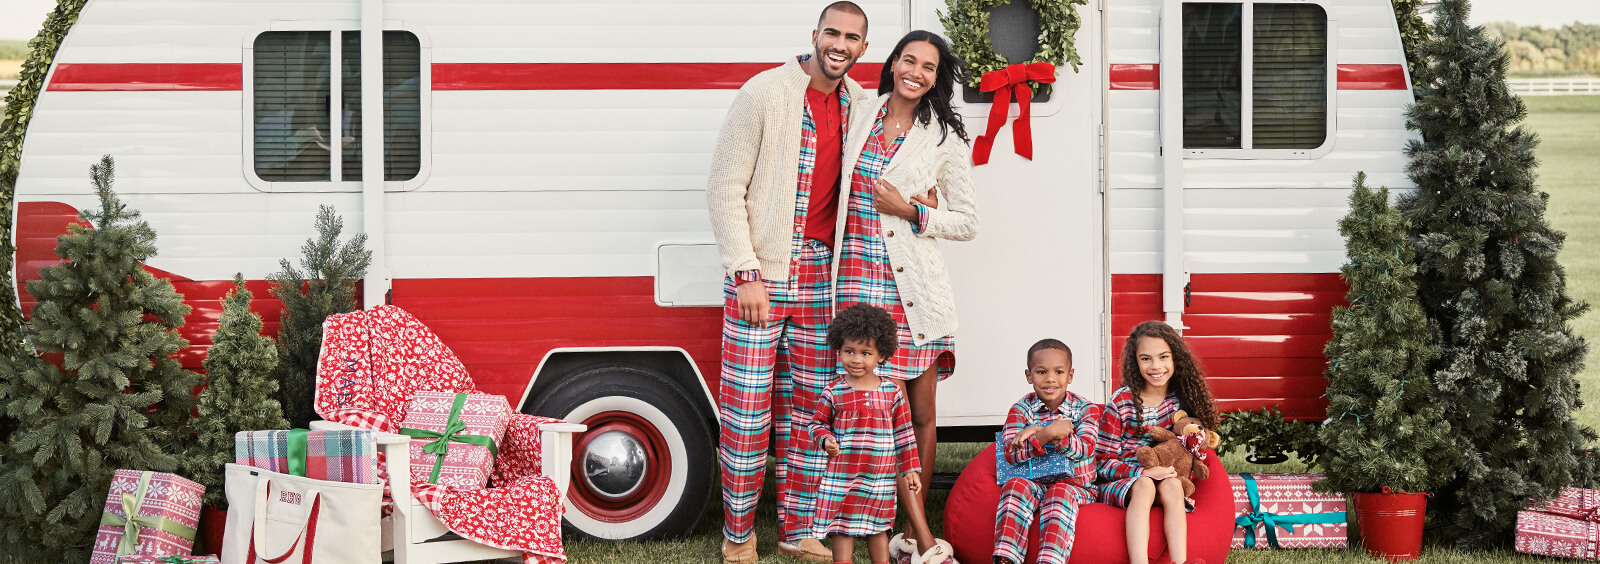 The Perfect Matching Family Christmas Pajamas for Any Big Family